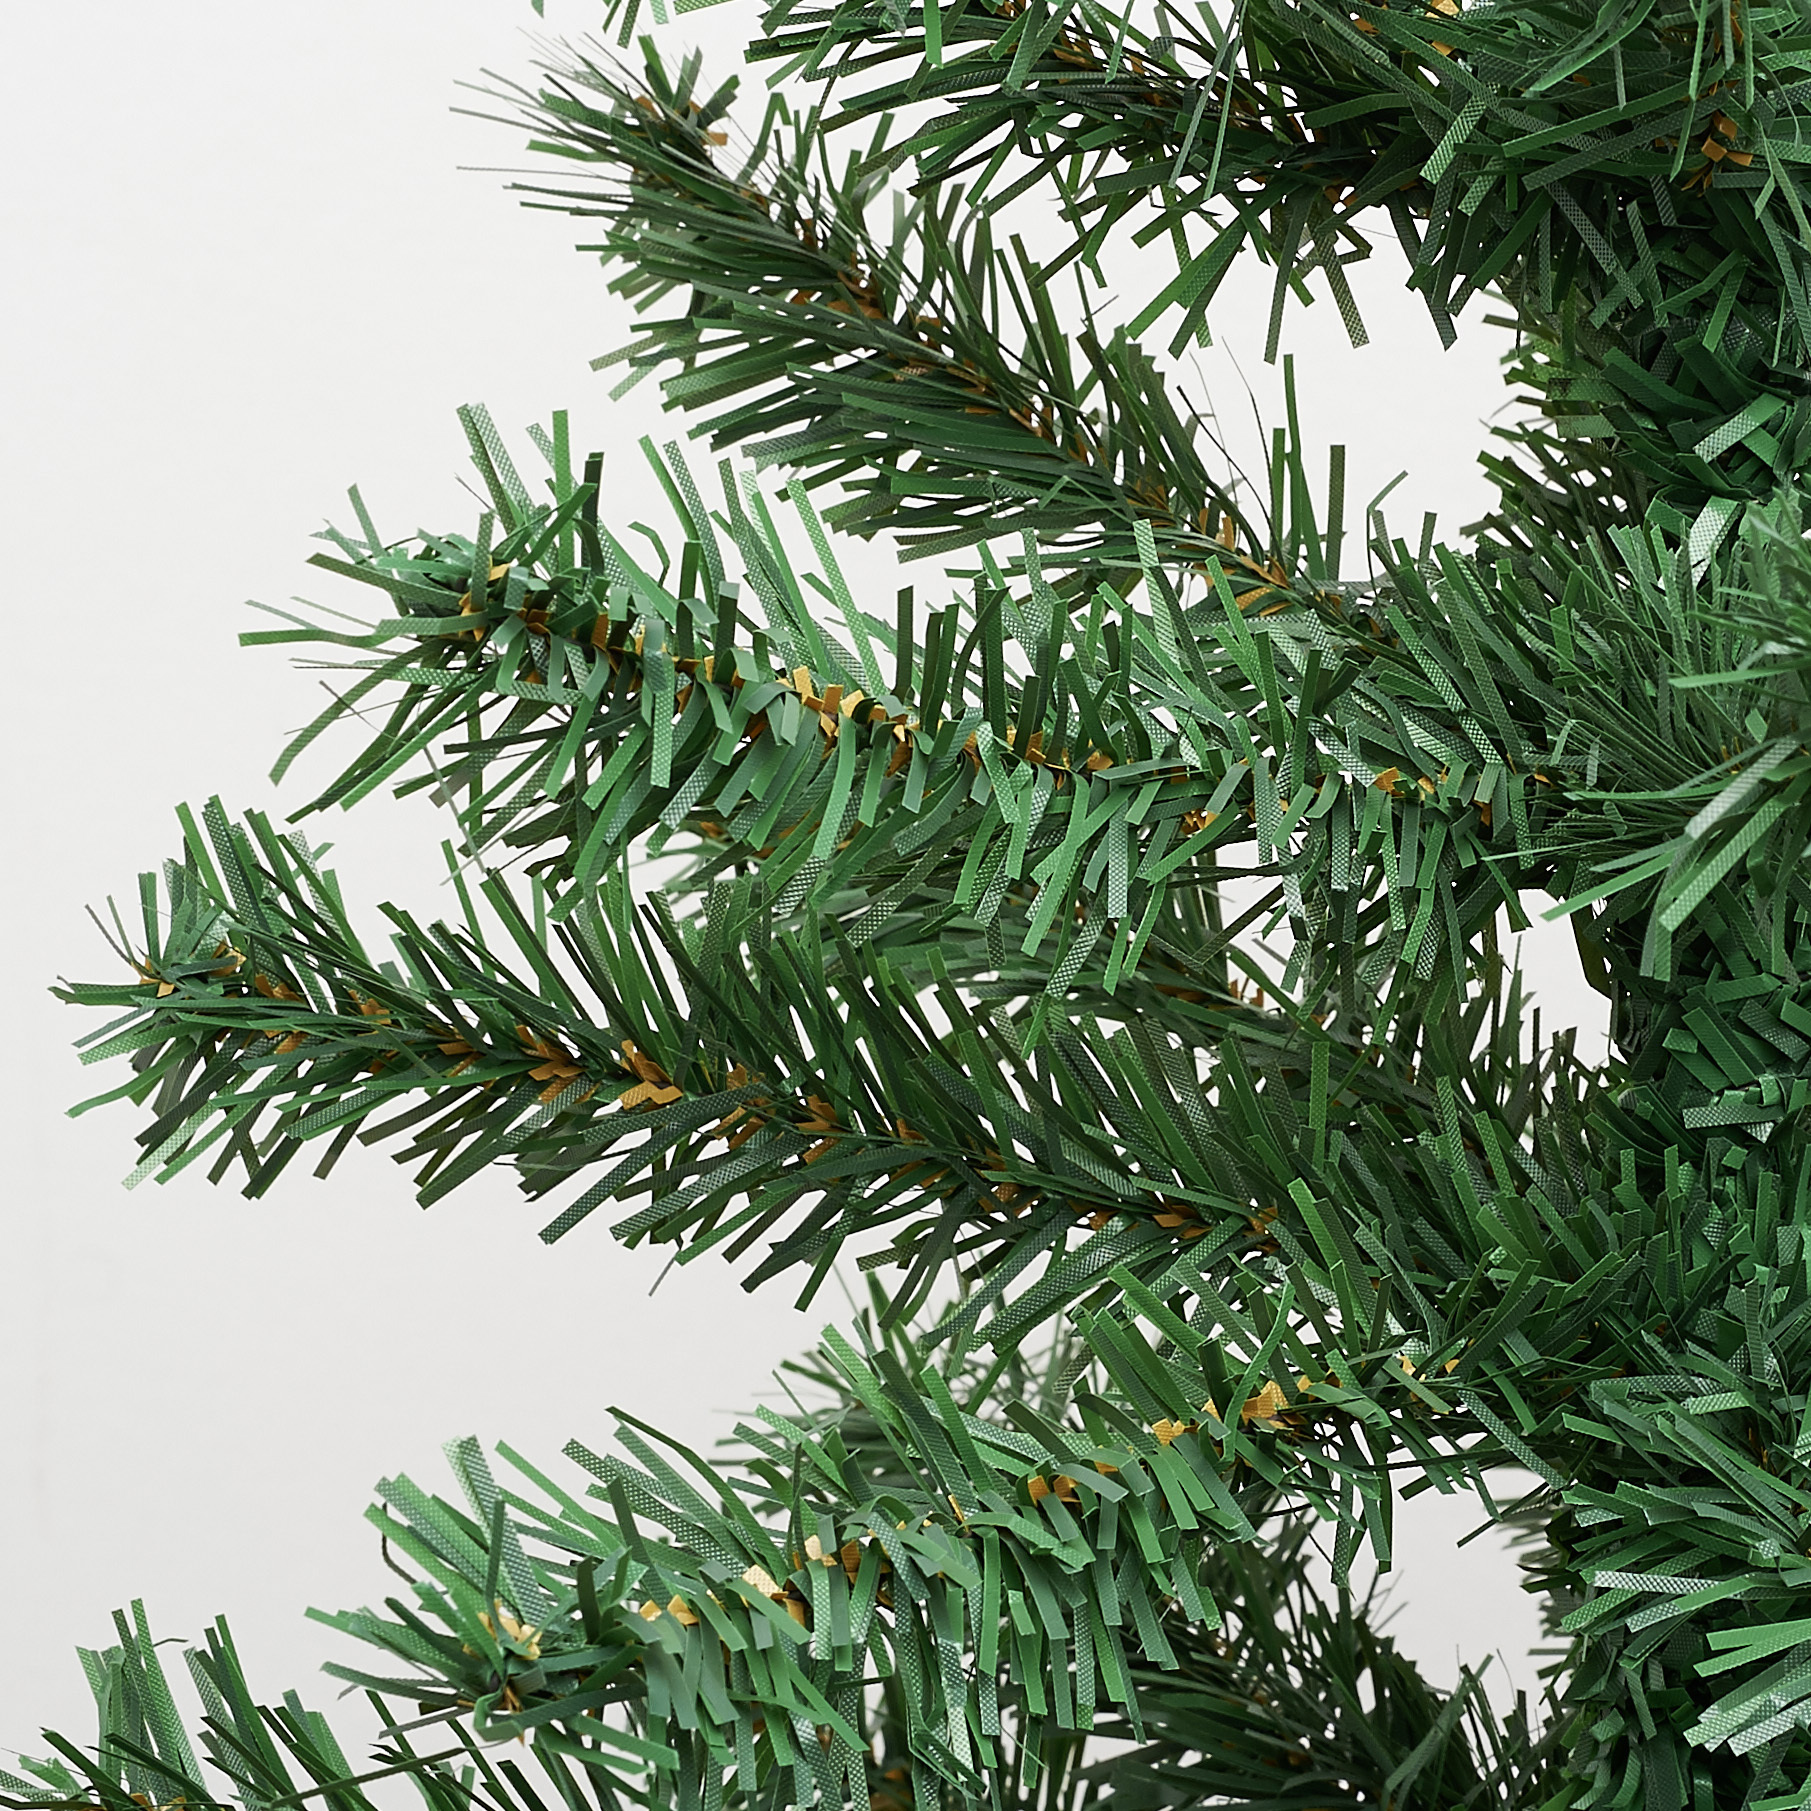 Carrefour sapin artificiel n 1 bis vert h 120 cm de61878 pas cher achat vente sapin - Sapin artificiel vert pas cher ...